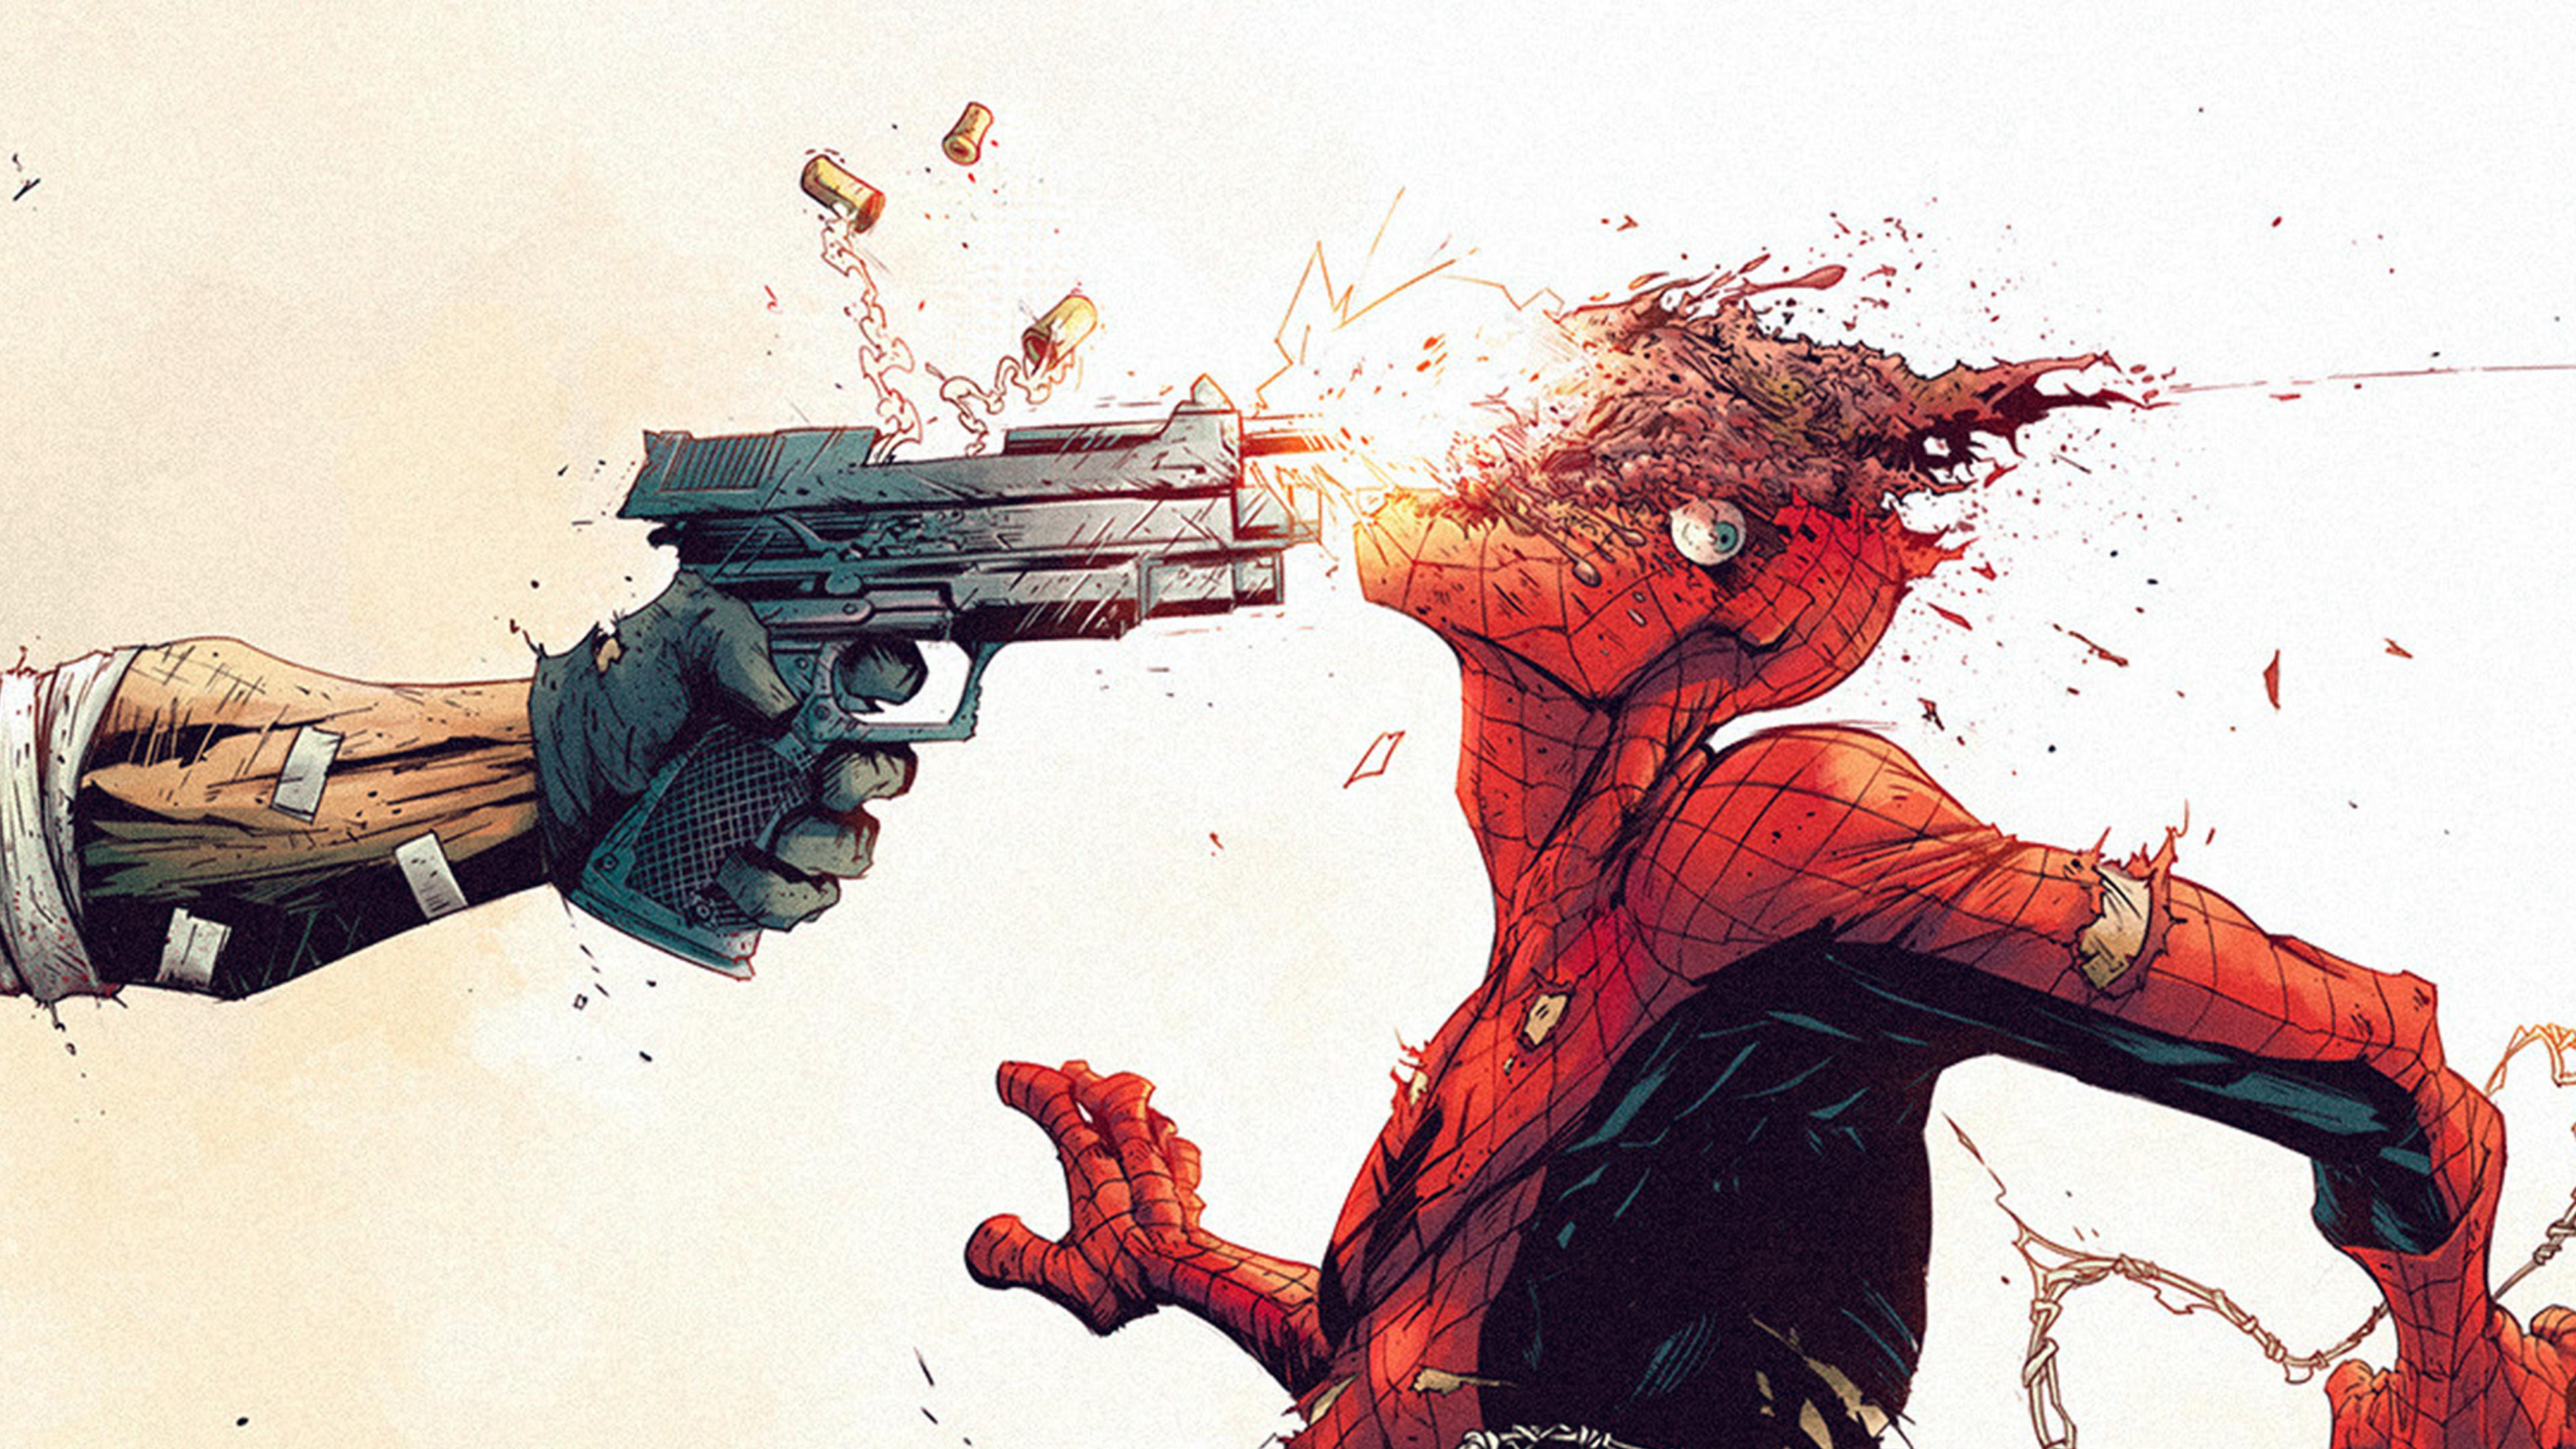 Aw51 Punisher Spiderman Tonton Revolver Illustration Art Gun Wallpaper